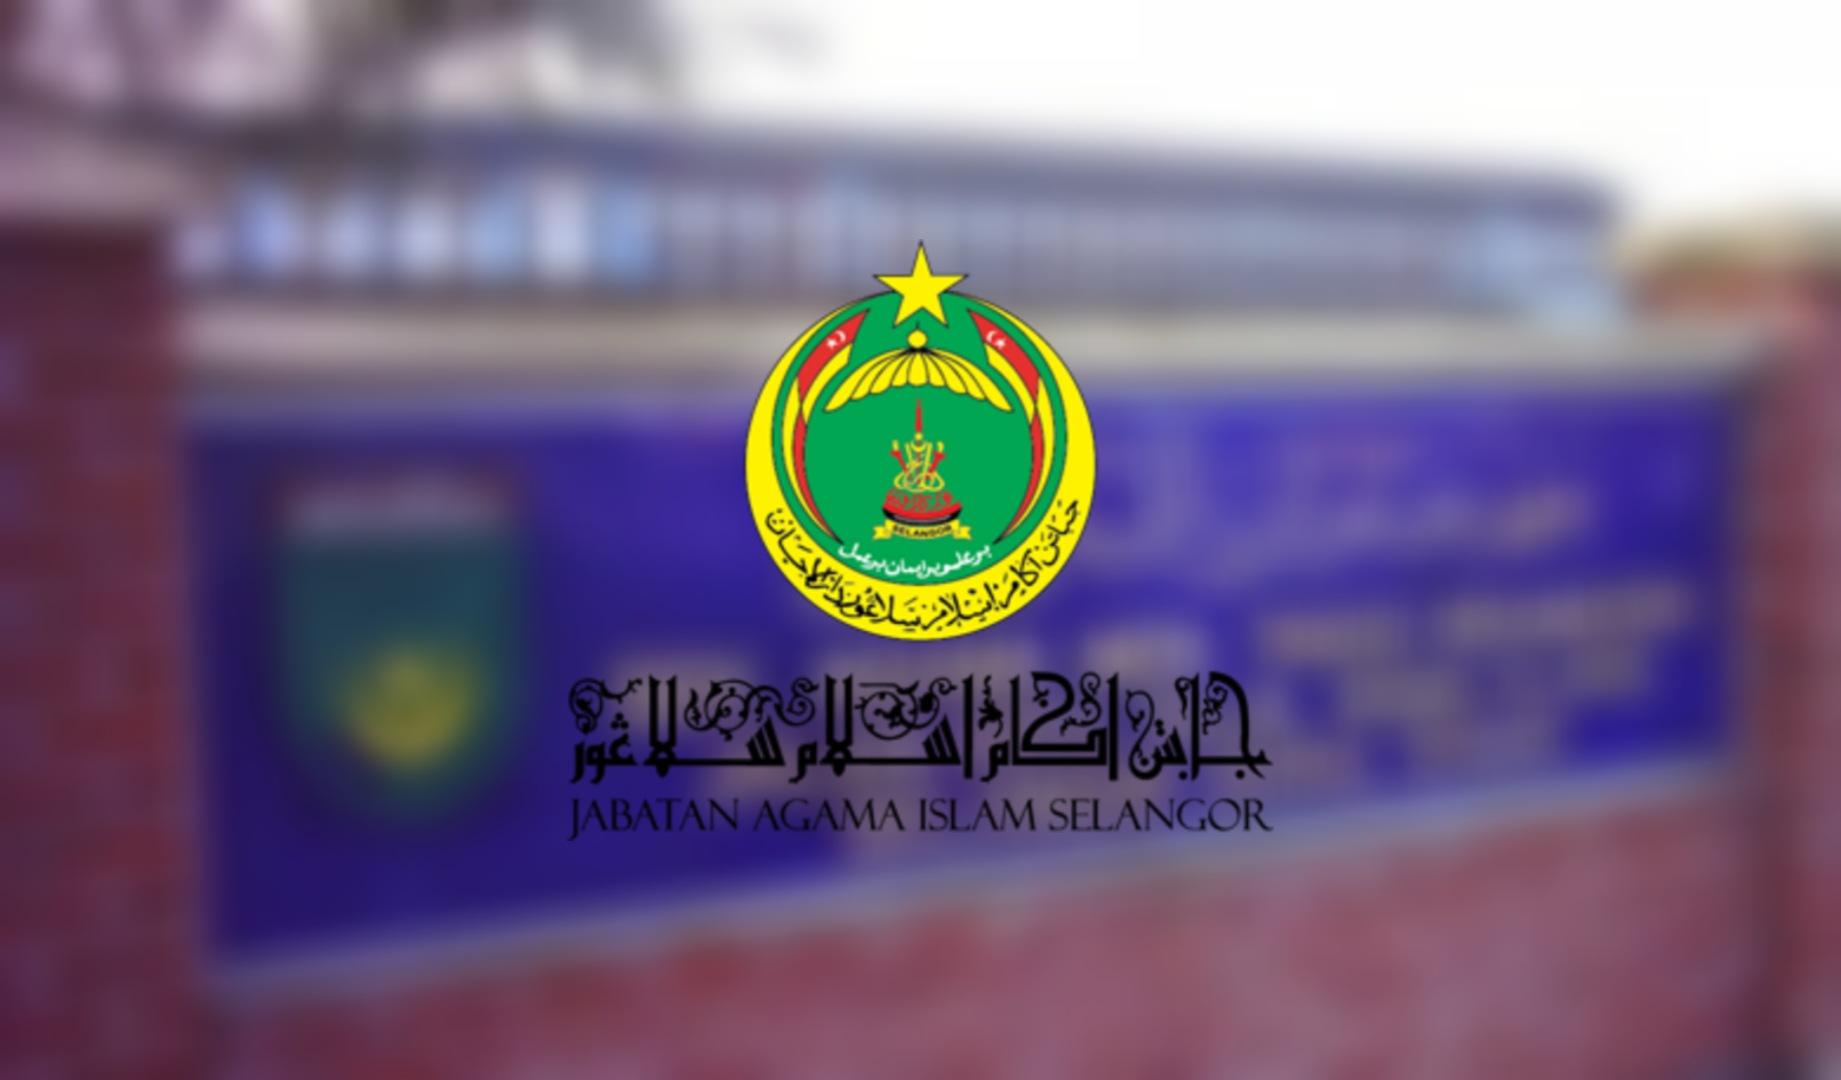 Permohonan SMA Selangor (SAM) 2022 Online (Semakan Keputusan)